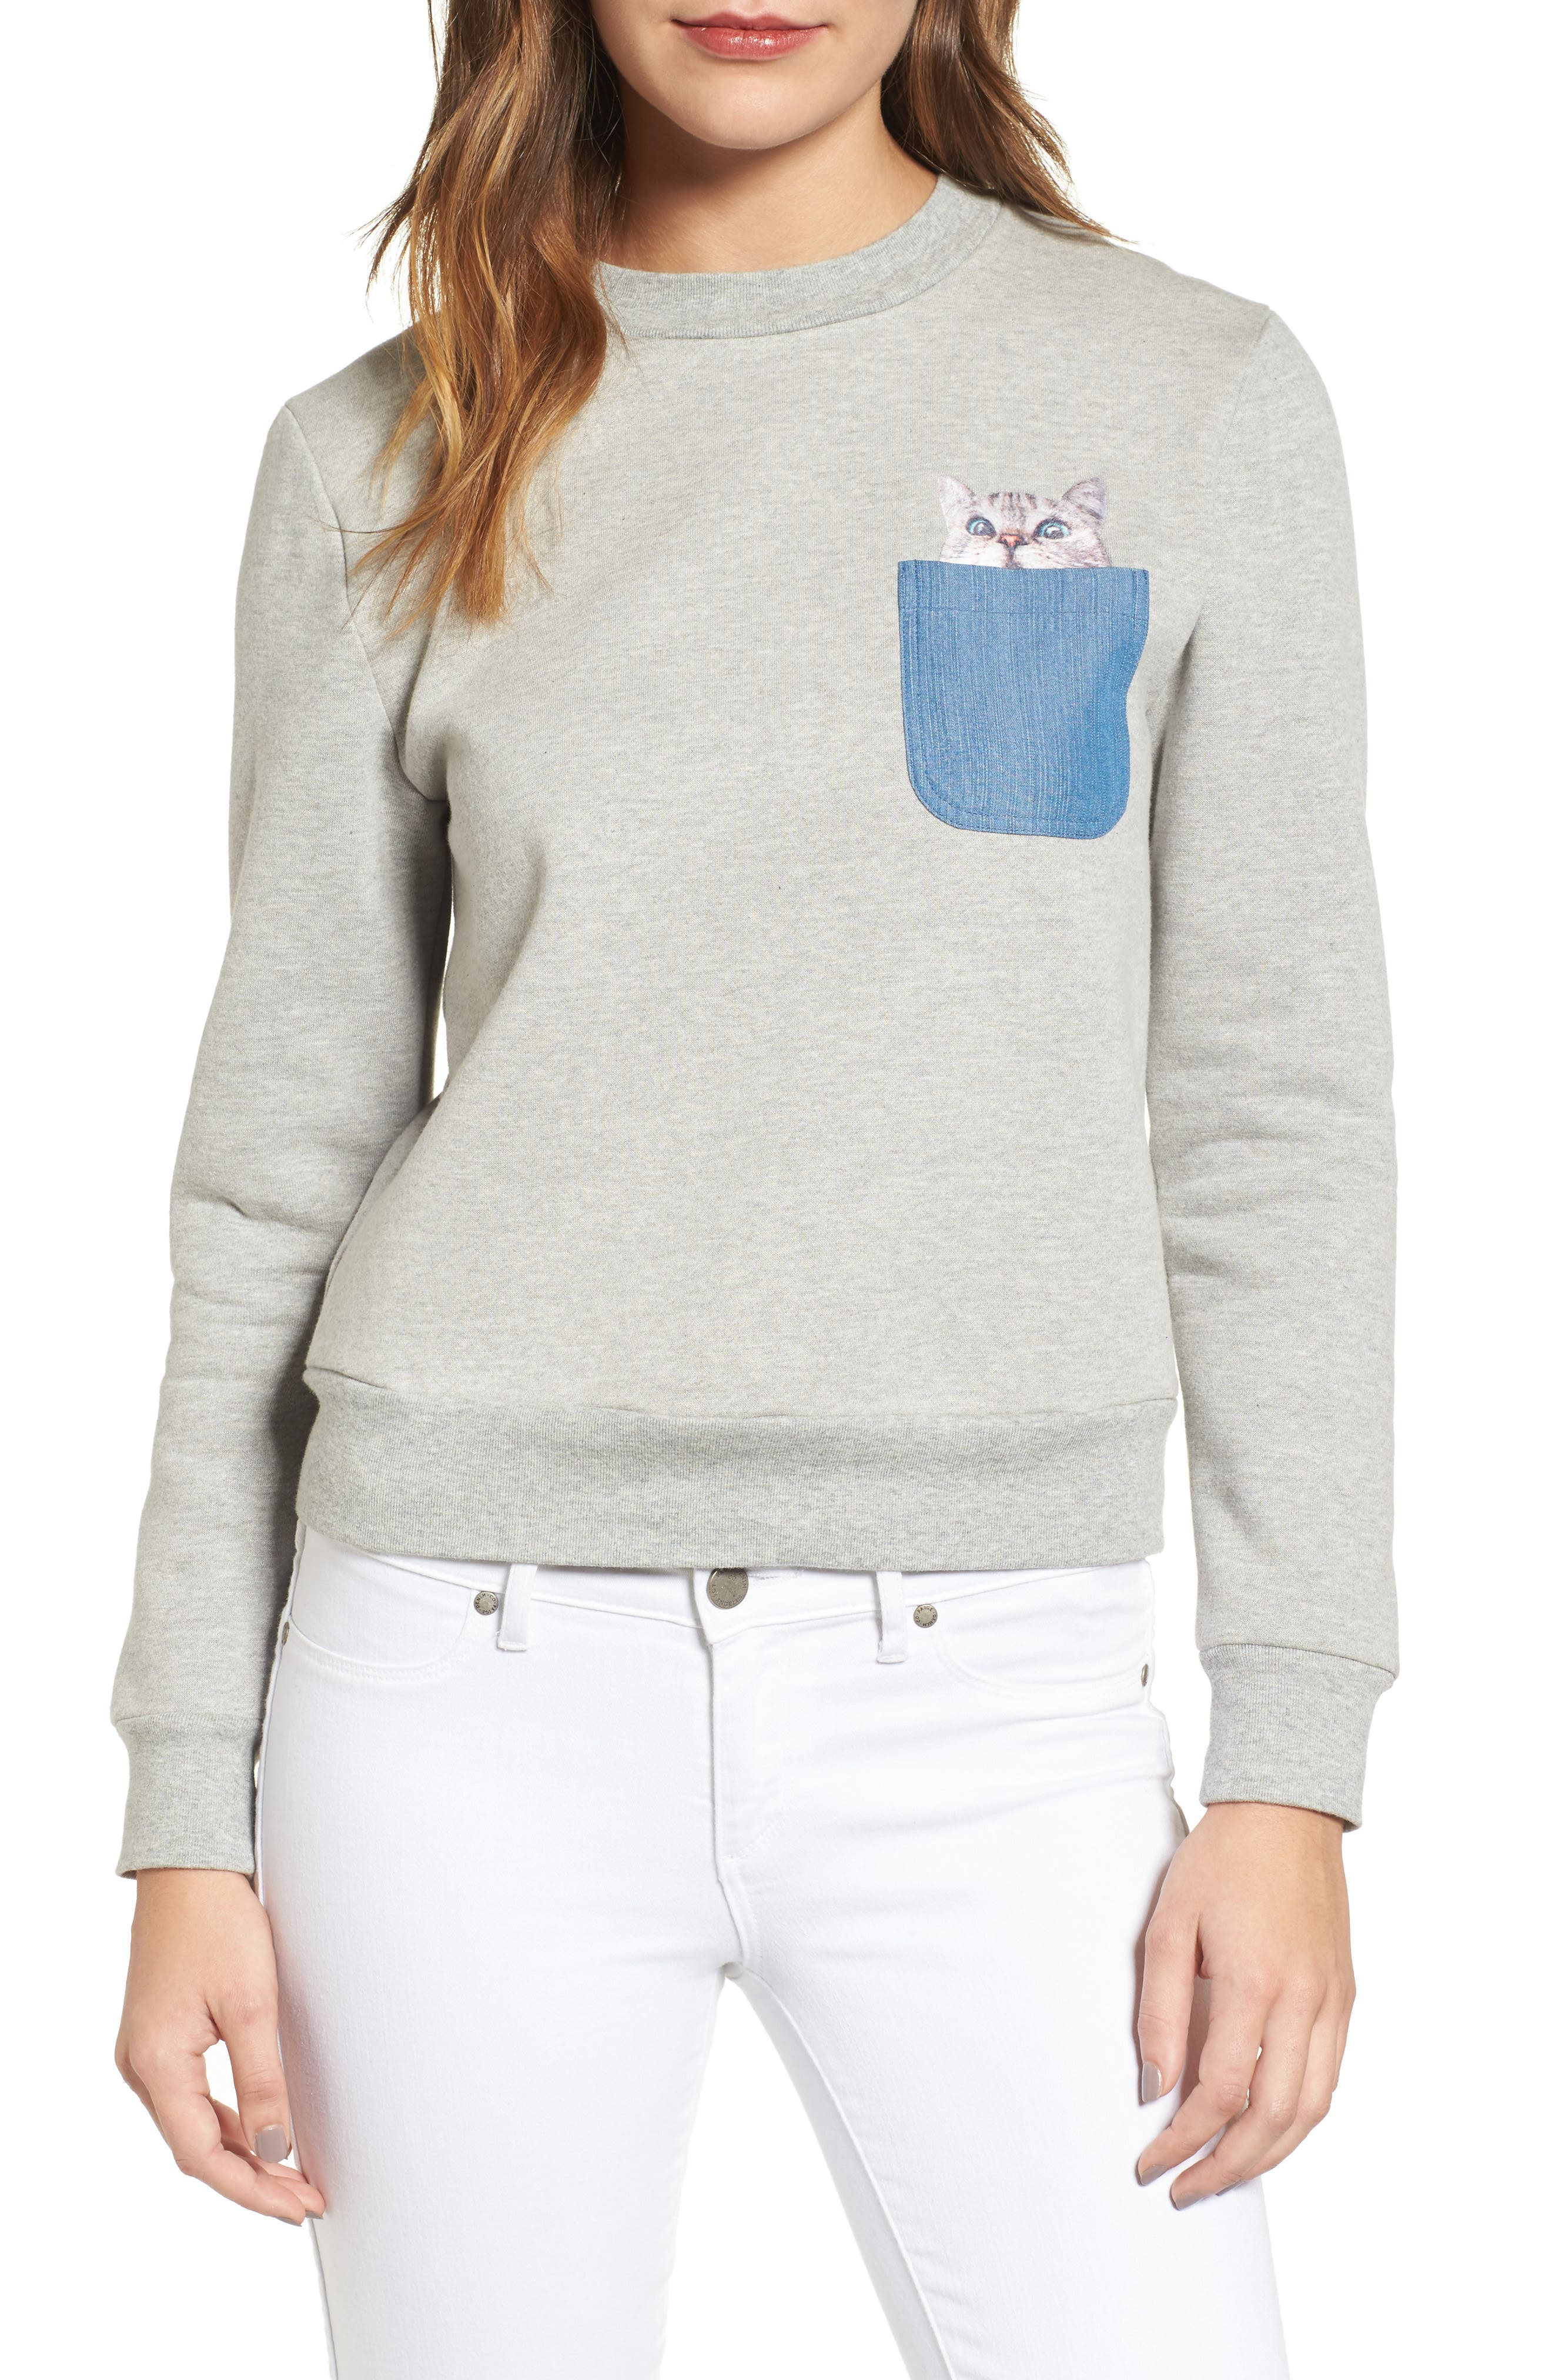 PAUL & JOE SISTER Street Sweatshirt